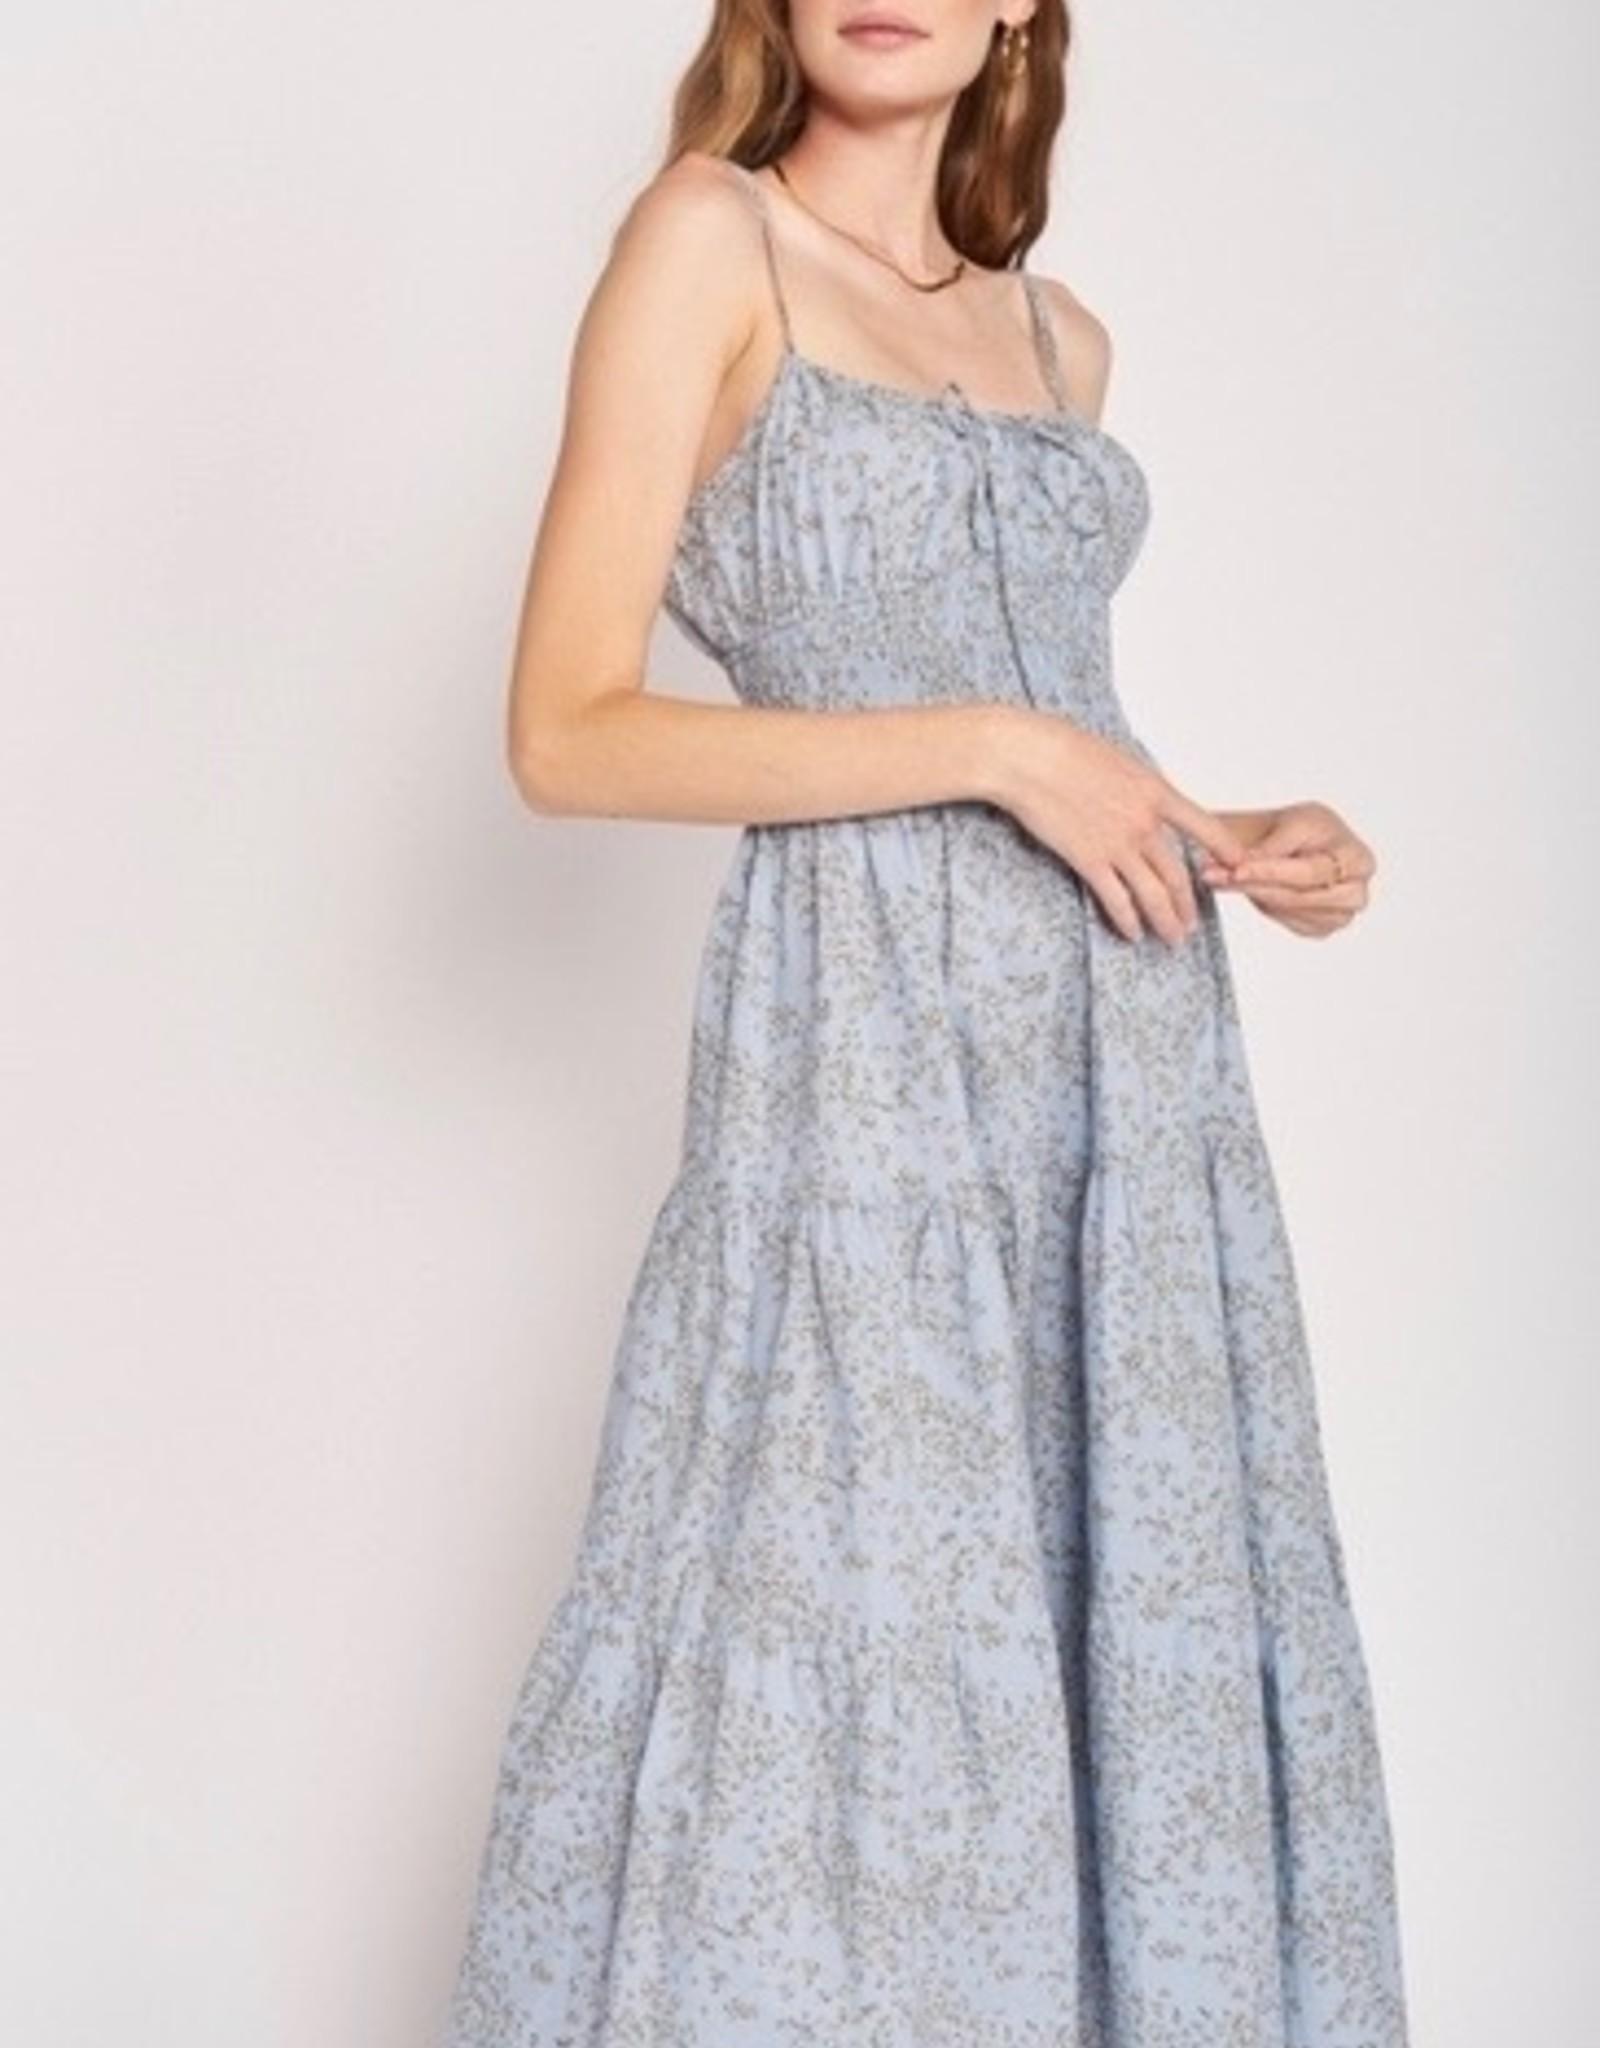 Emory Park IMC6573D Spaghetti Strap Midi Dress